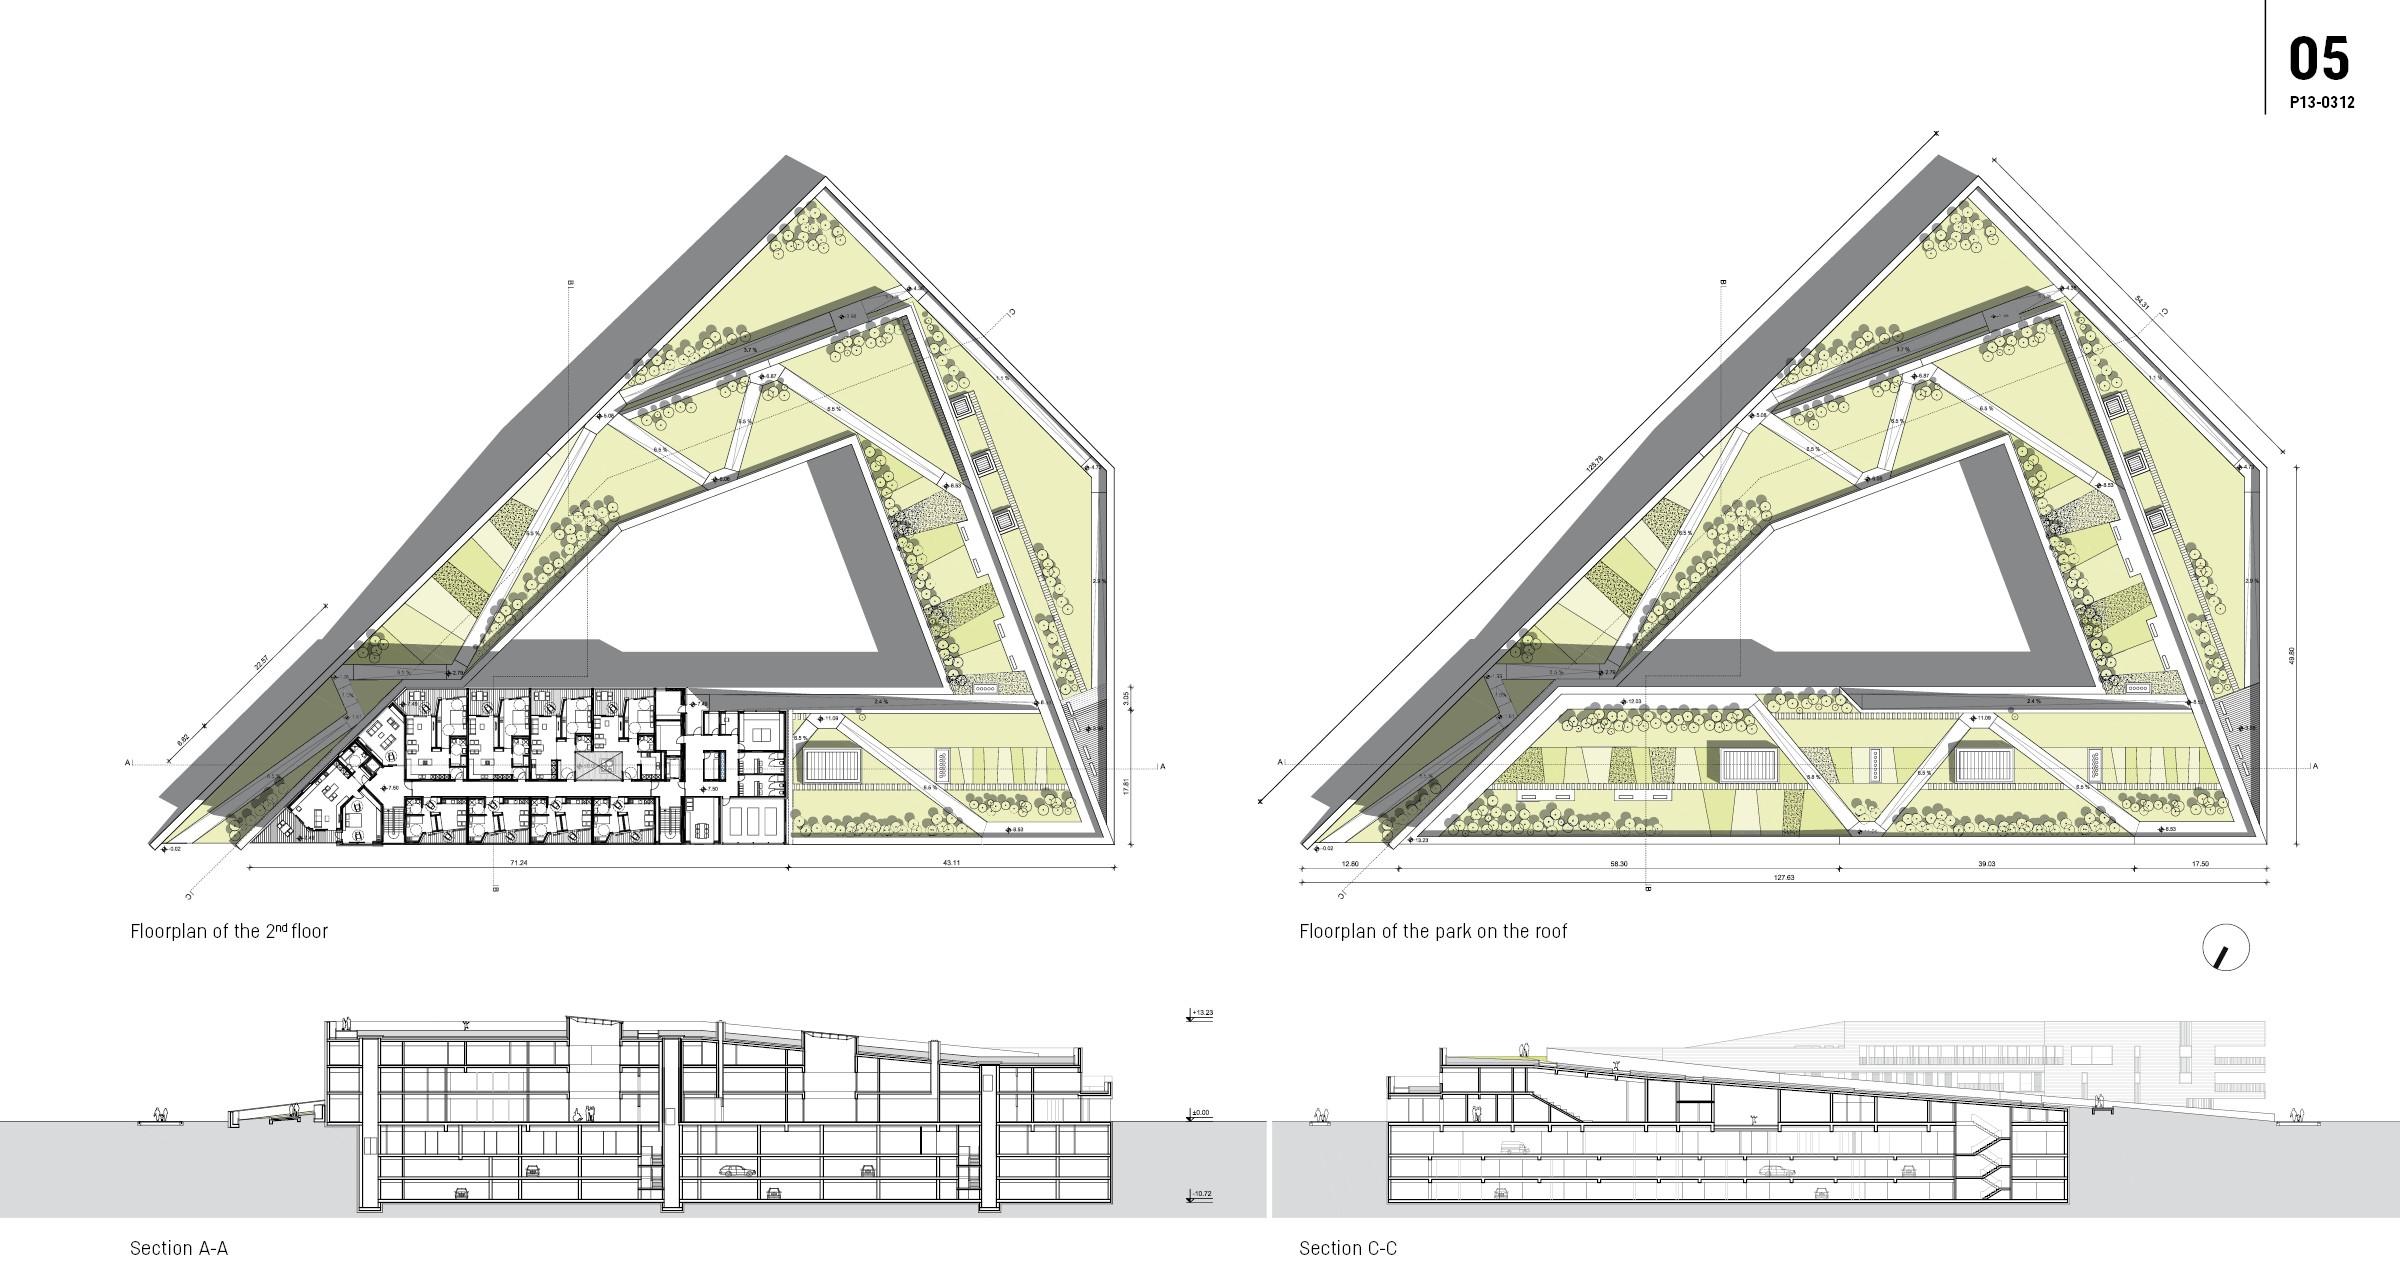 Kindergarten Plan Elevation Section : Archiprix intergenerational centre in ljubljana